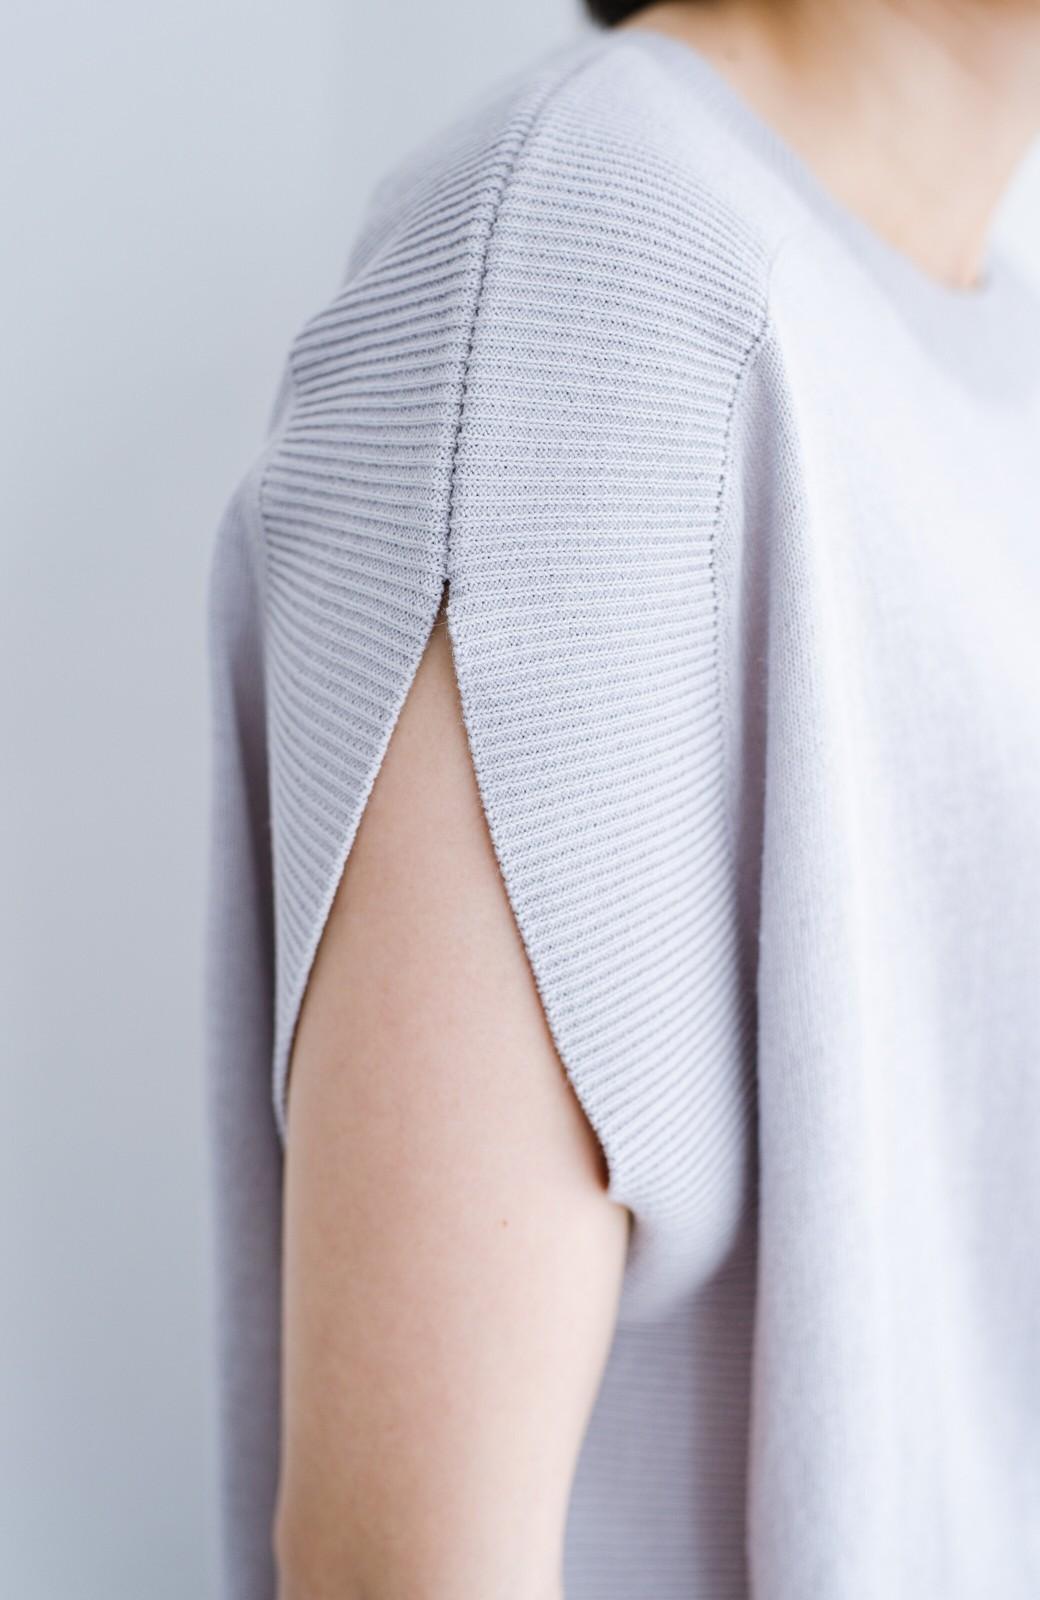 haco! カットソー感覚で着られる 洗えるオトナニットトップス by MAKORI <ライトグレー>の商品写真3